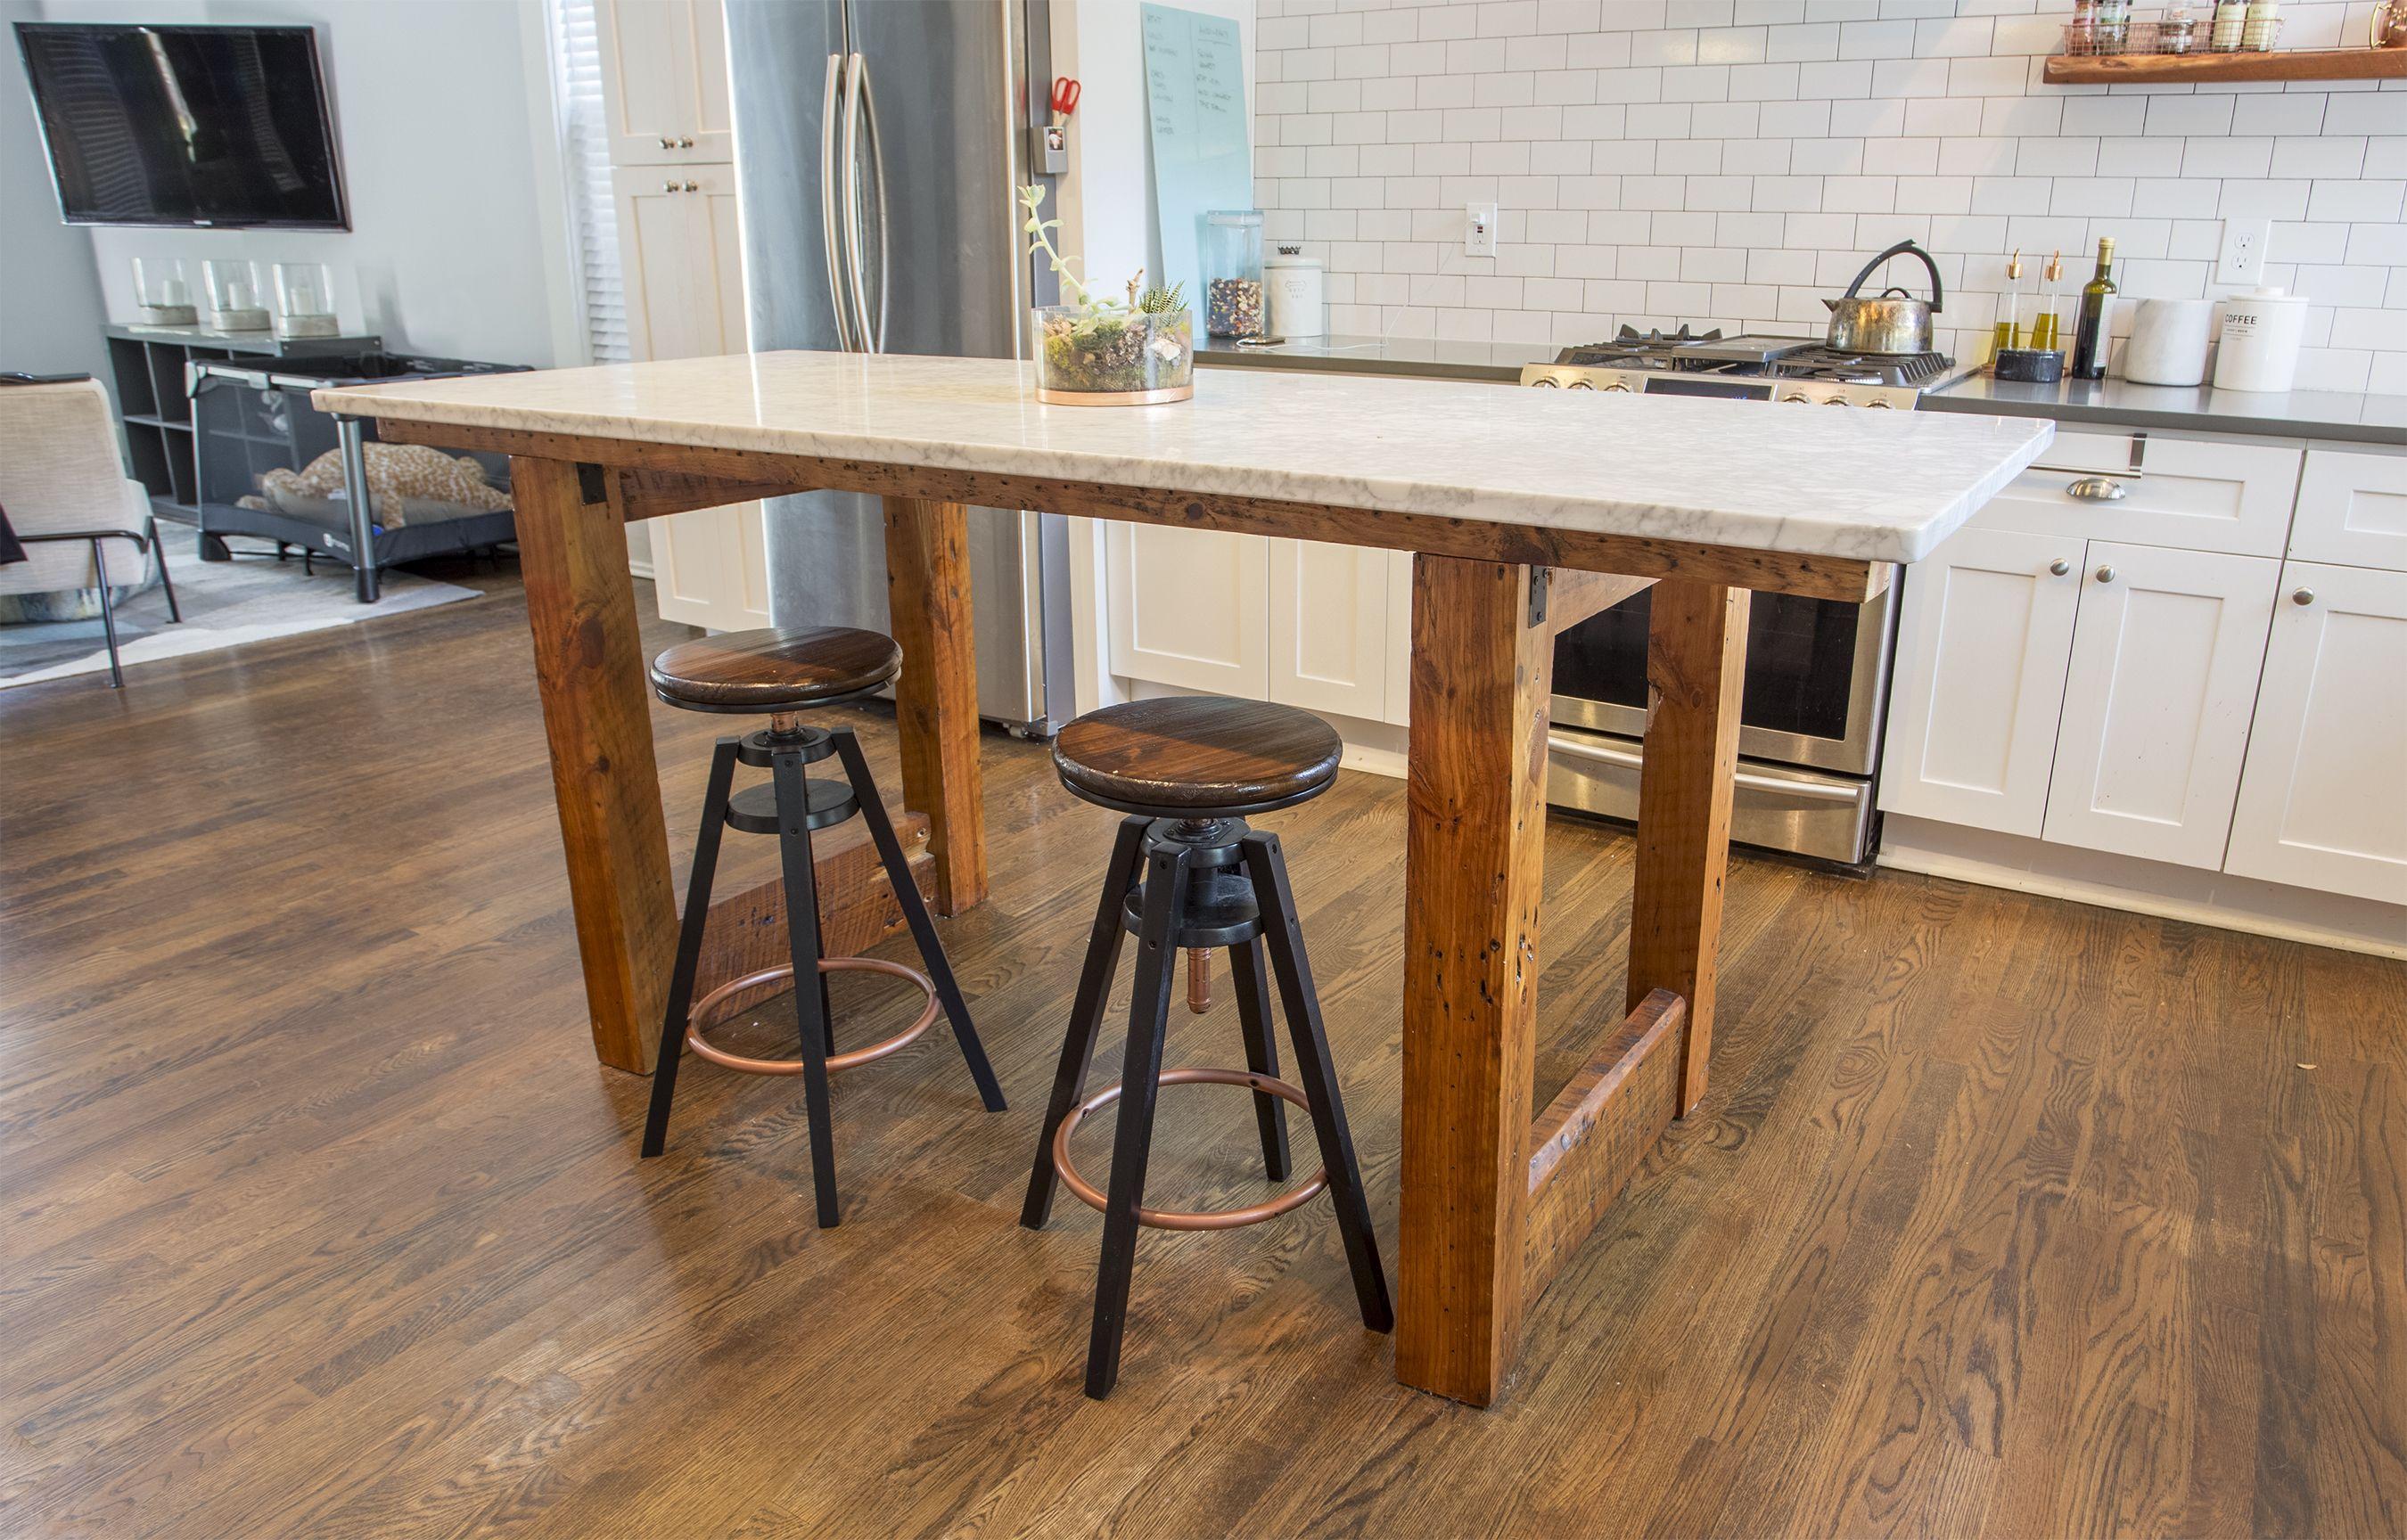 Custom reclaimed wood kitchen island with Carrerra Marble top